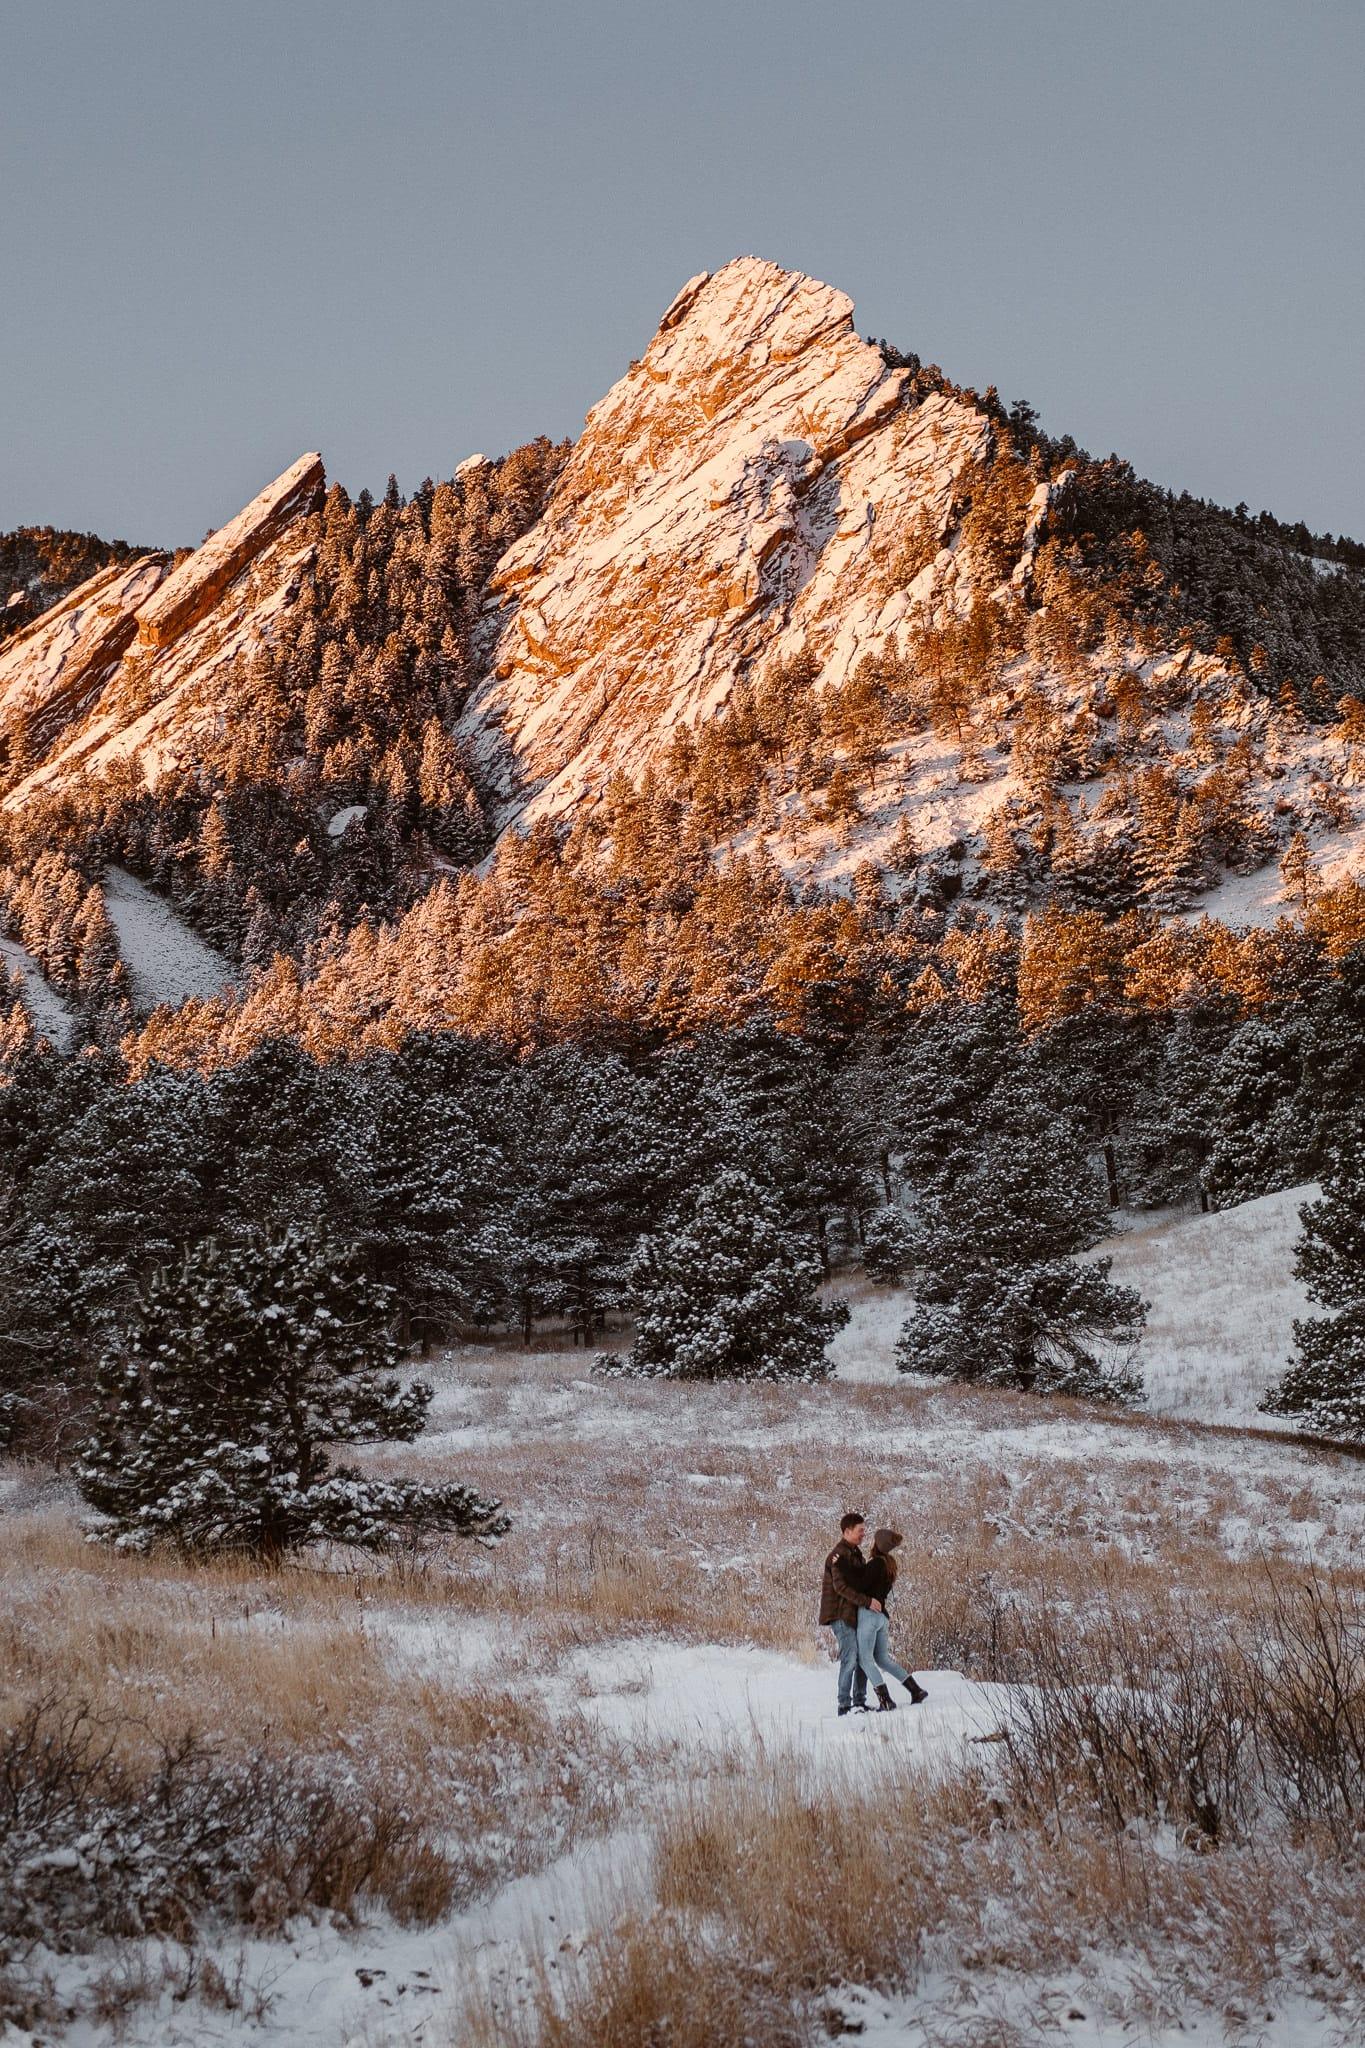 Couple hiking mountains at sunrise, Chautauqua winter engagement photography session, Boulder engagement photographer, sunrise hiking engagement session, Colorado wedding photographer